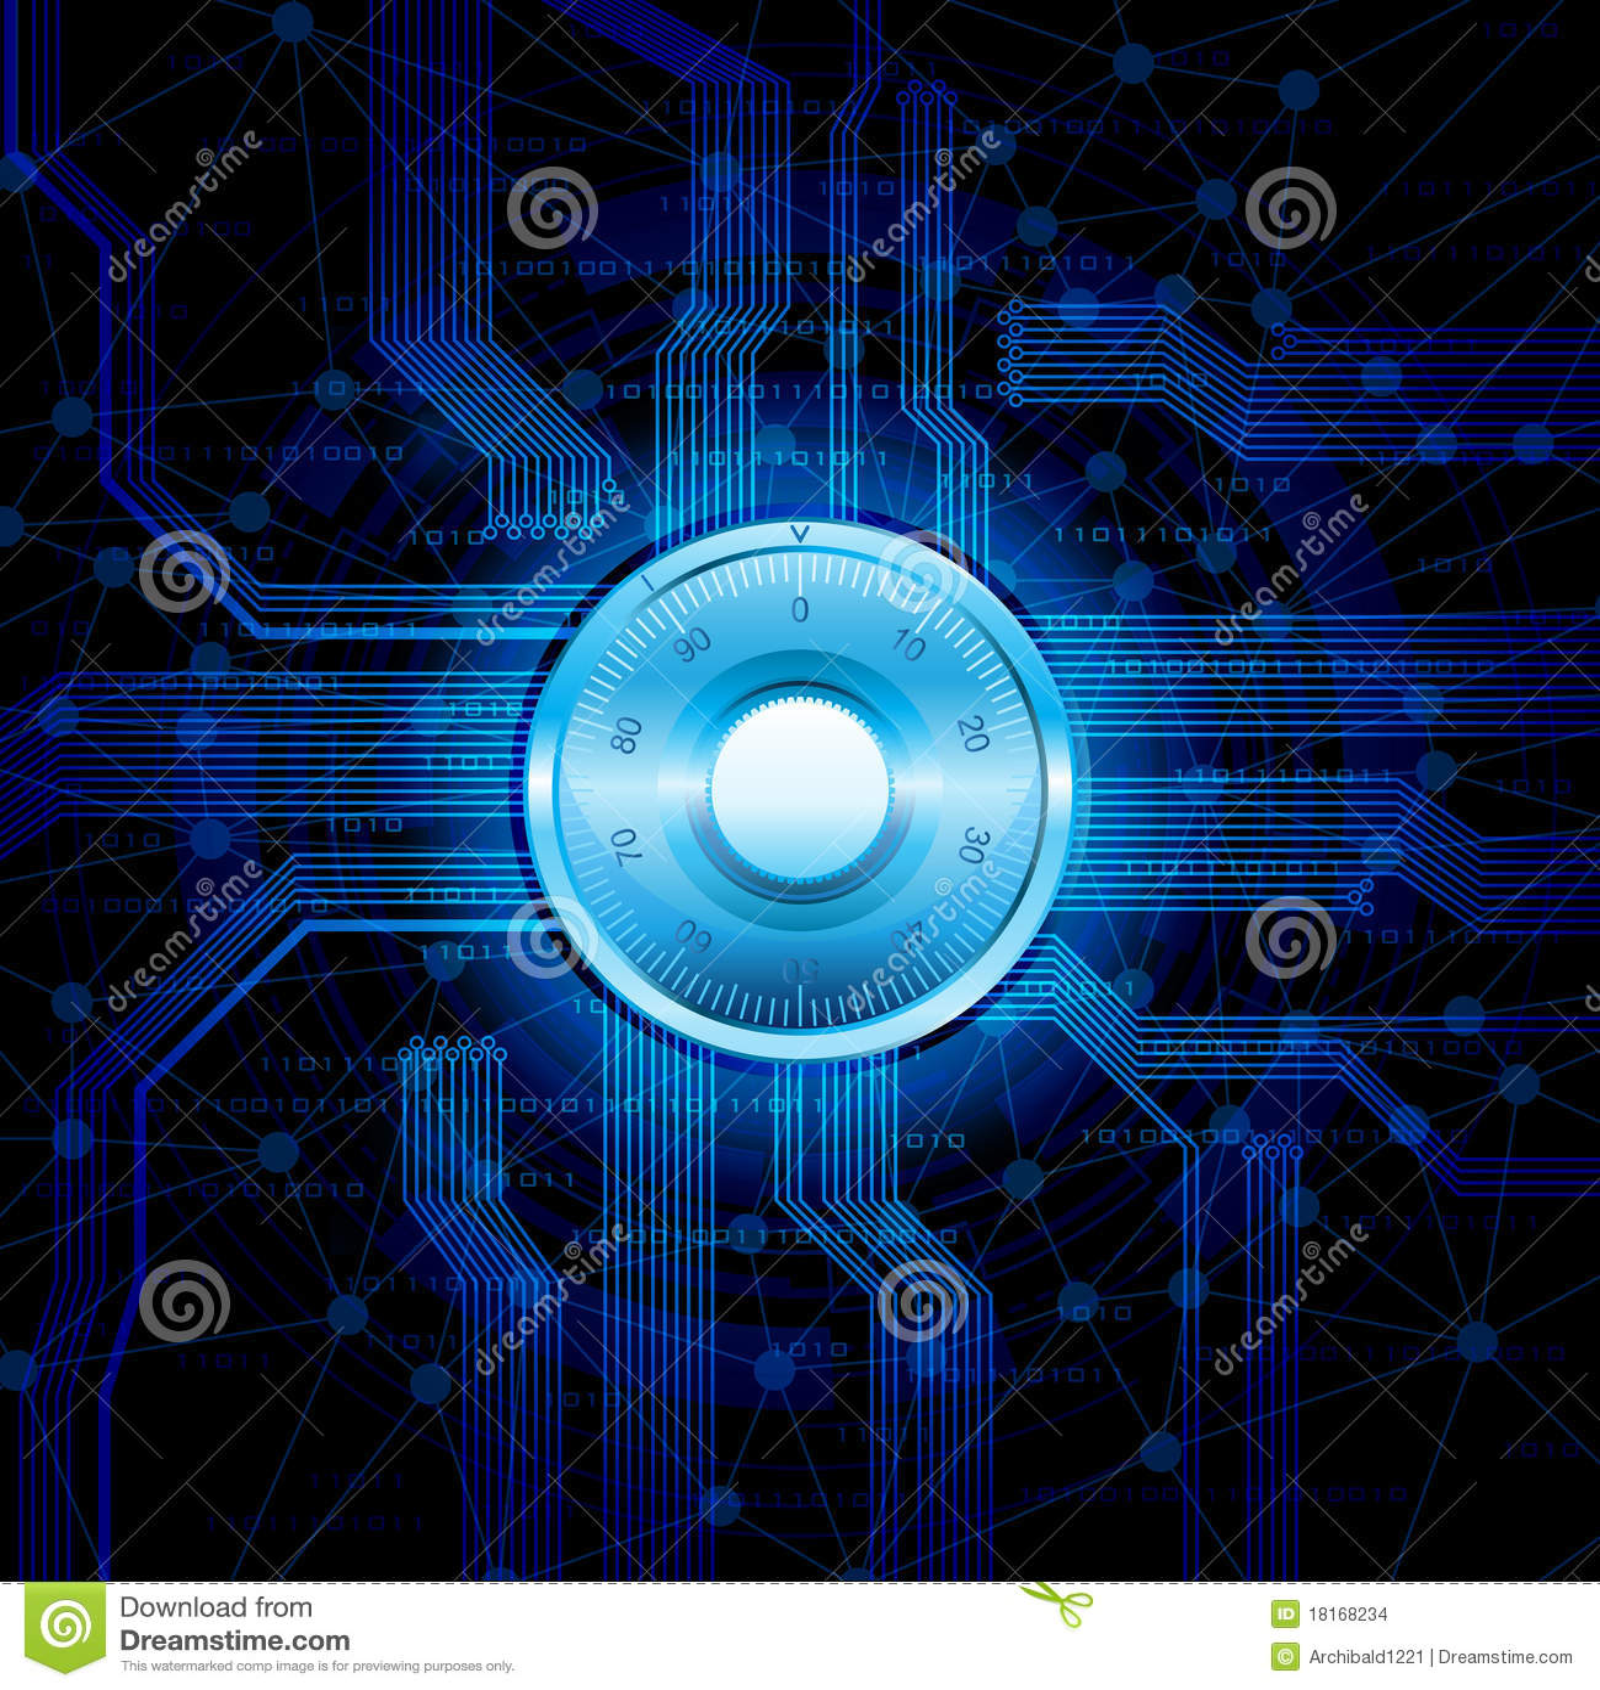 Web Based Security